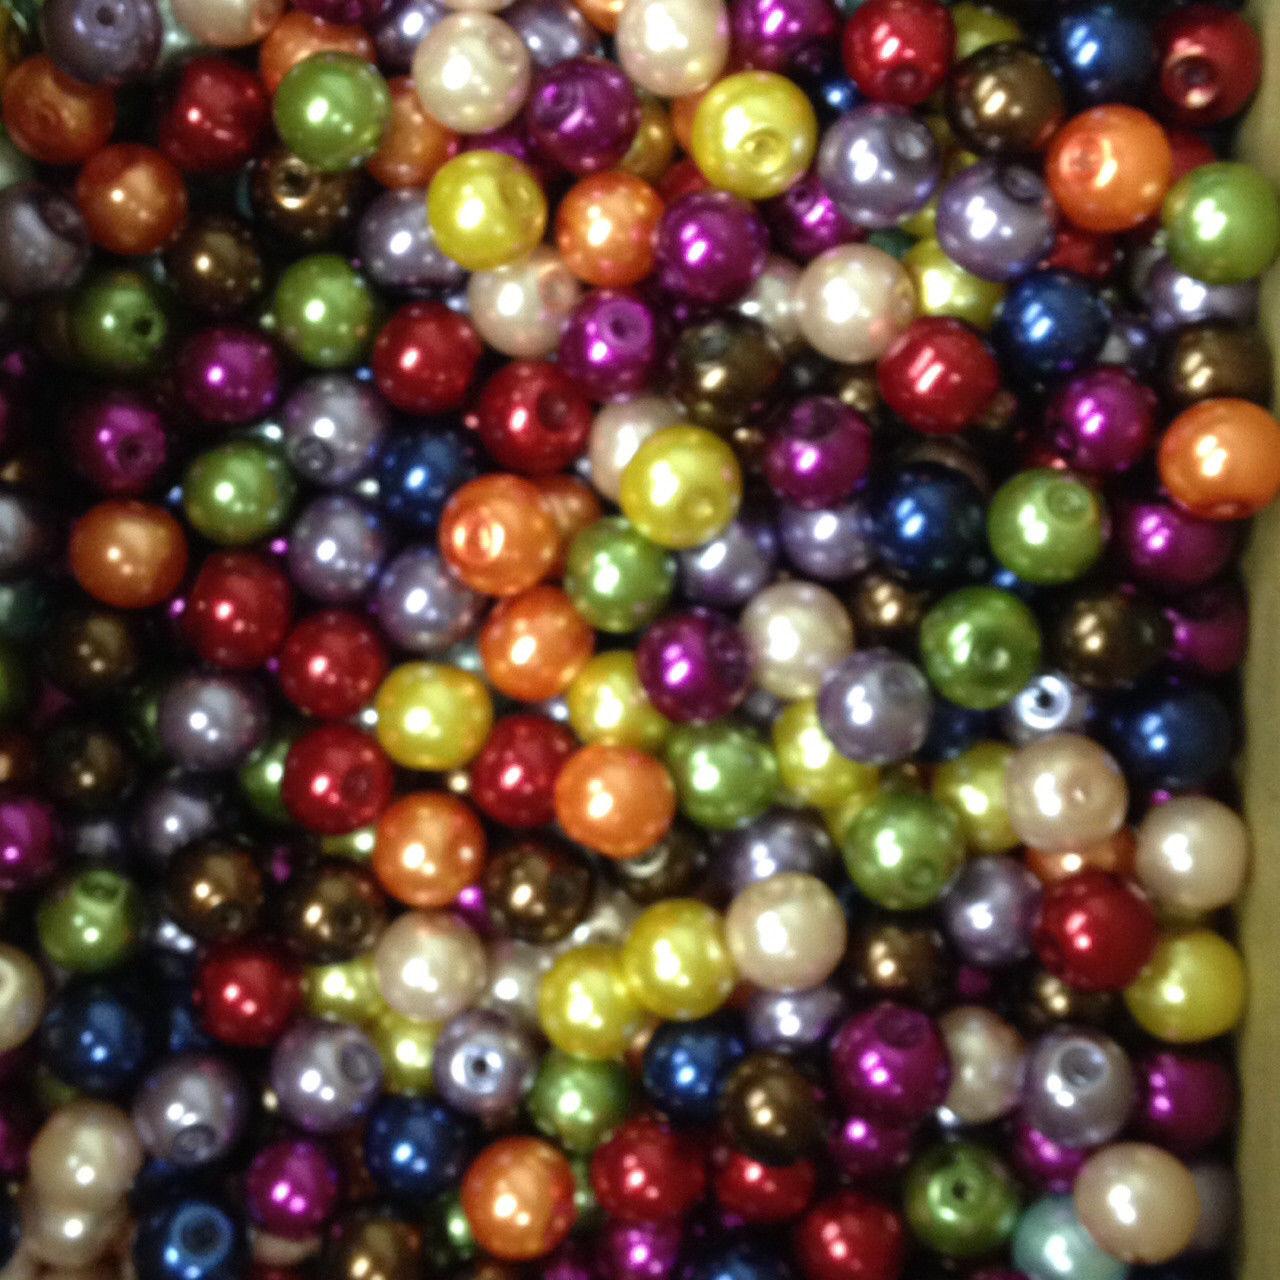 Large Jewellery Making Starter Kit 1000+ Beads Tools Findings Storage Box